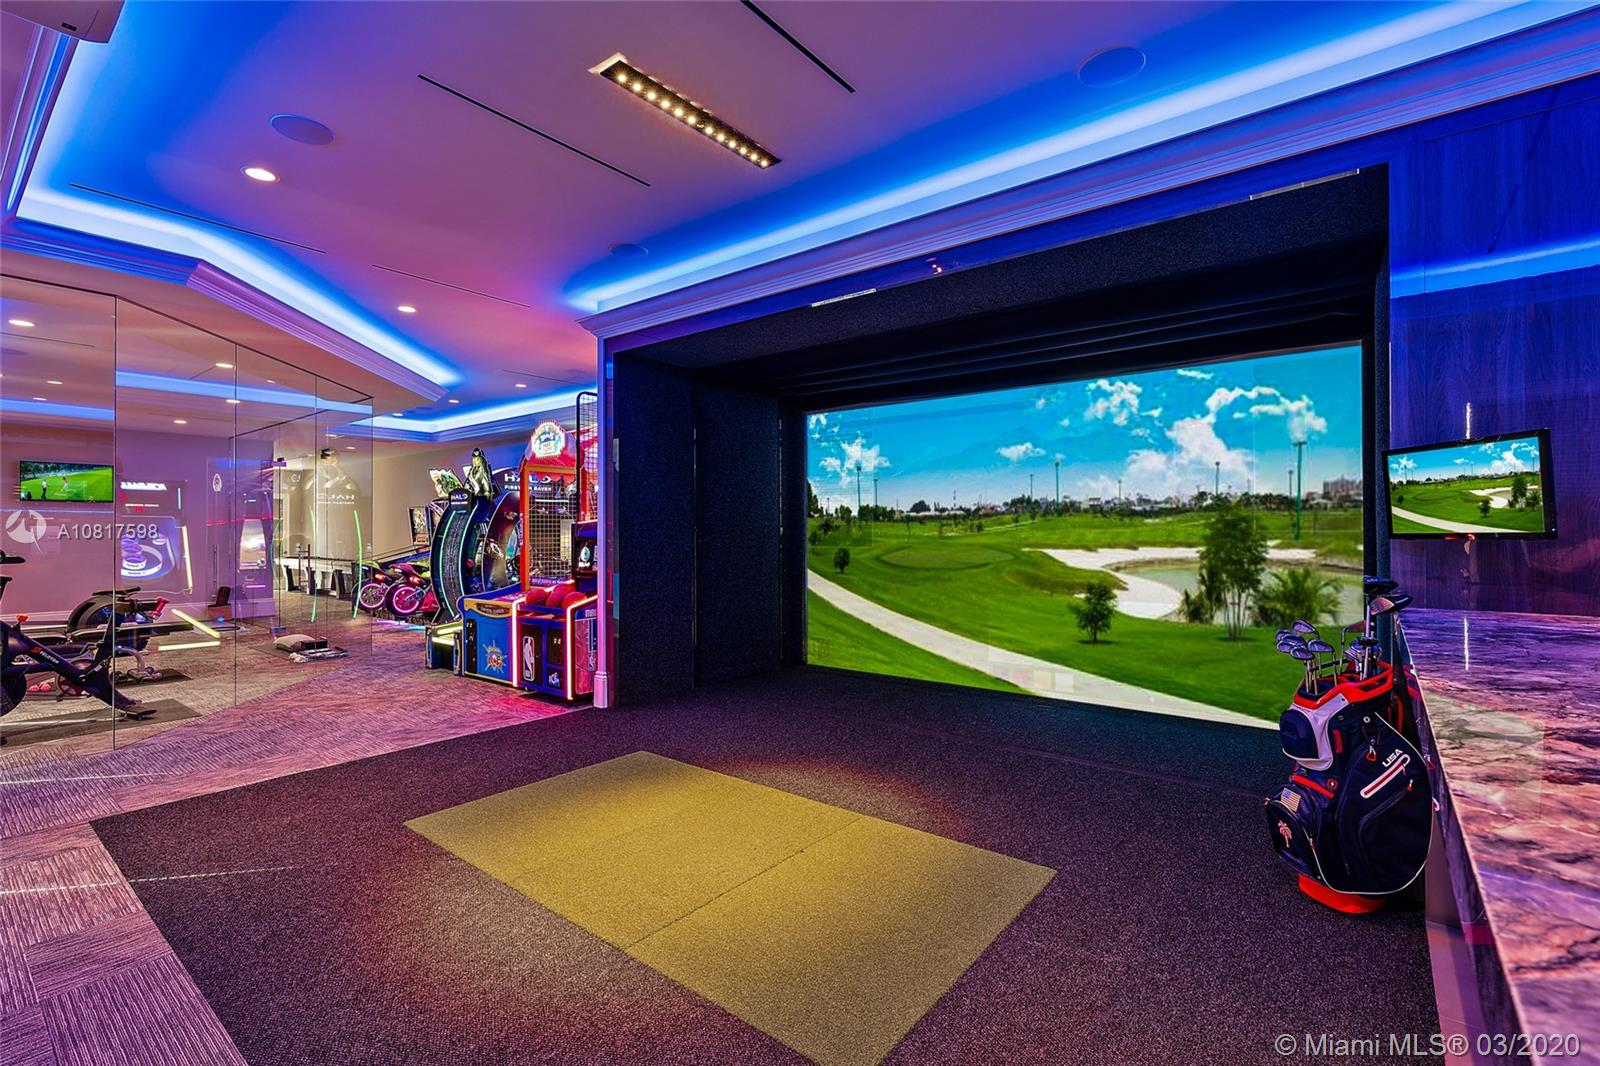 Game Room Simulator